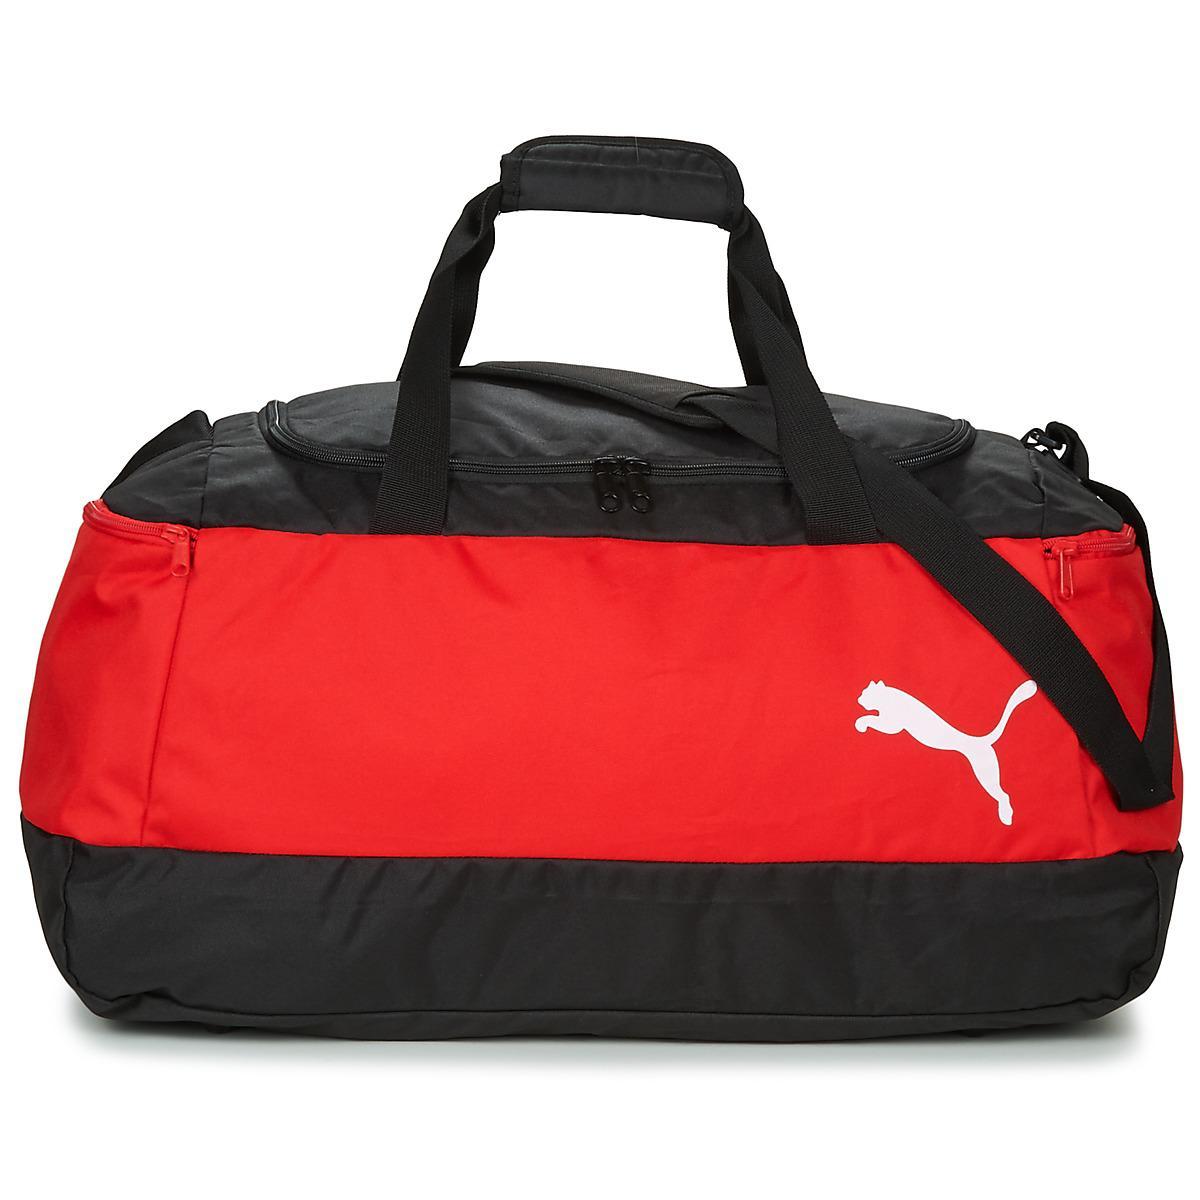 0a7765351c59 PUMA Pro Training Ii Medium Bag Men s Sports Bag In Black in Black ...